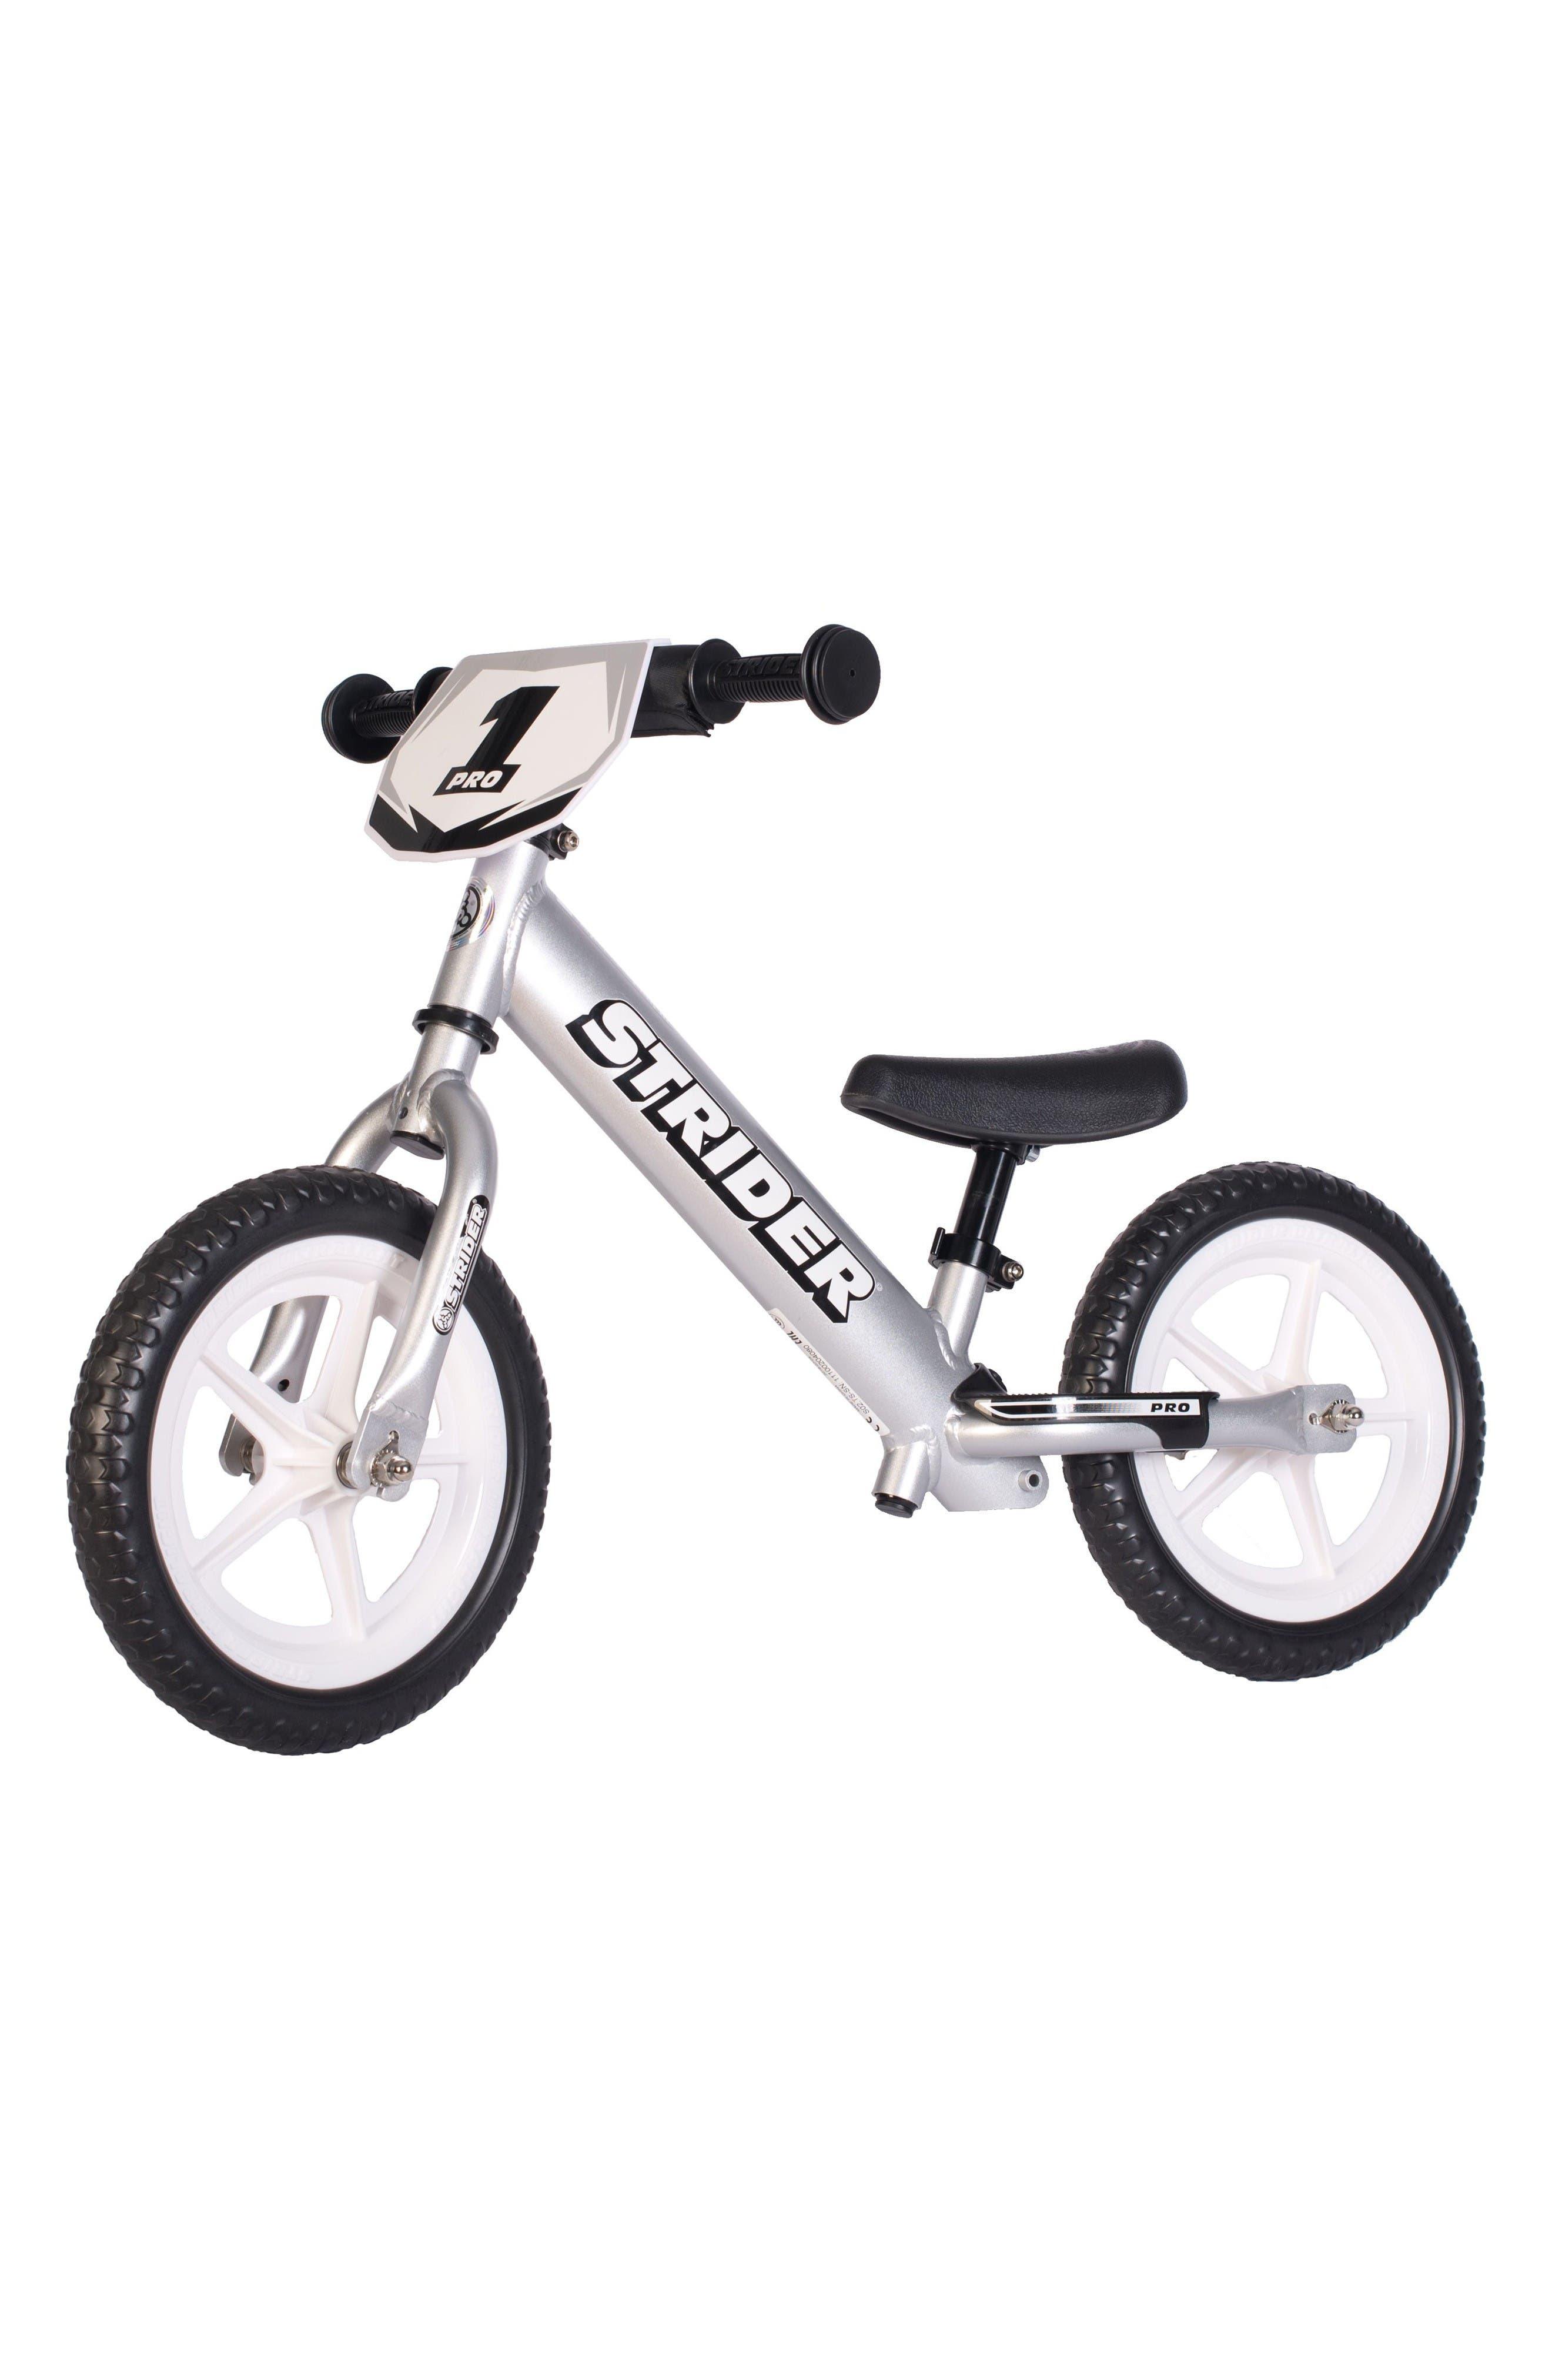 Main Image - STRIDER® 12 Pro Balance No Pedal Bike